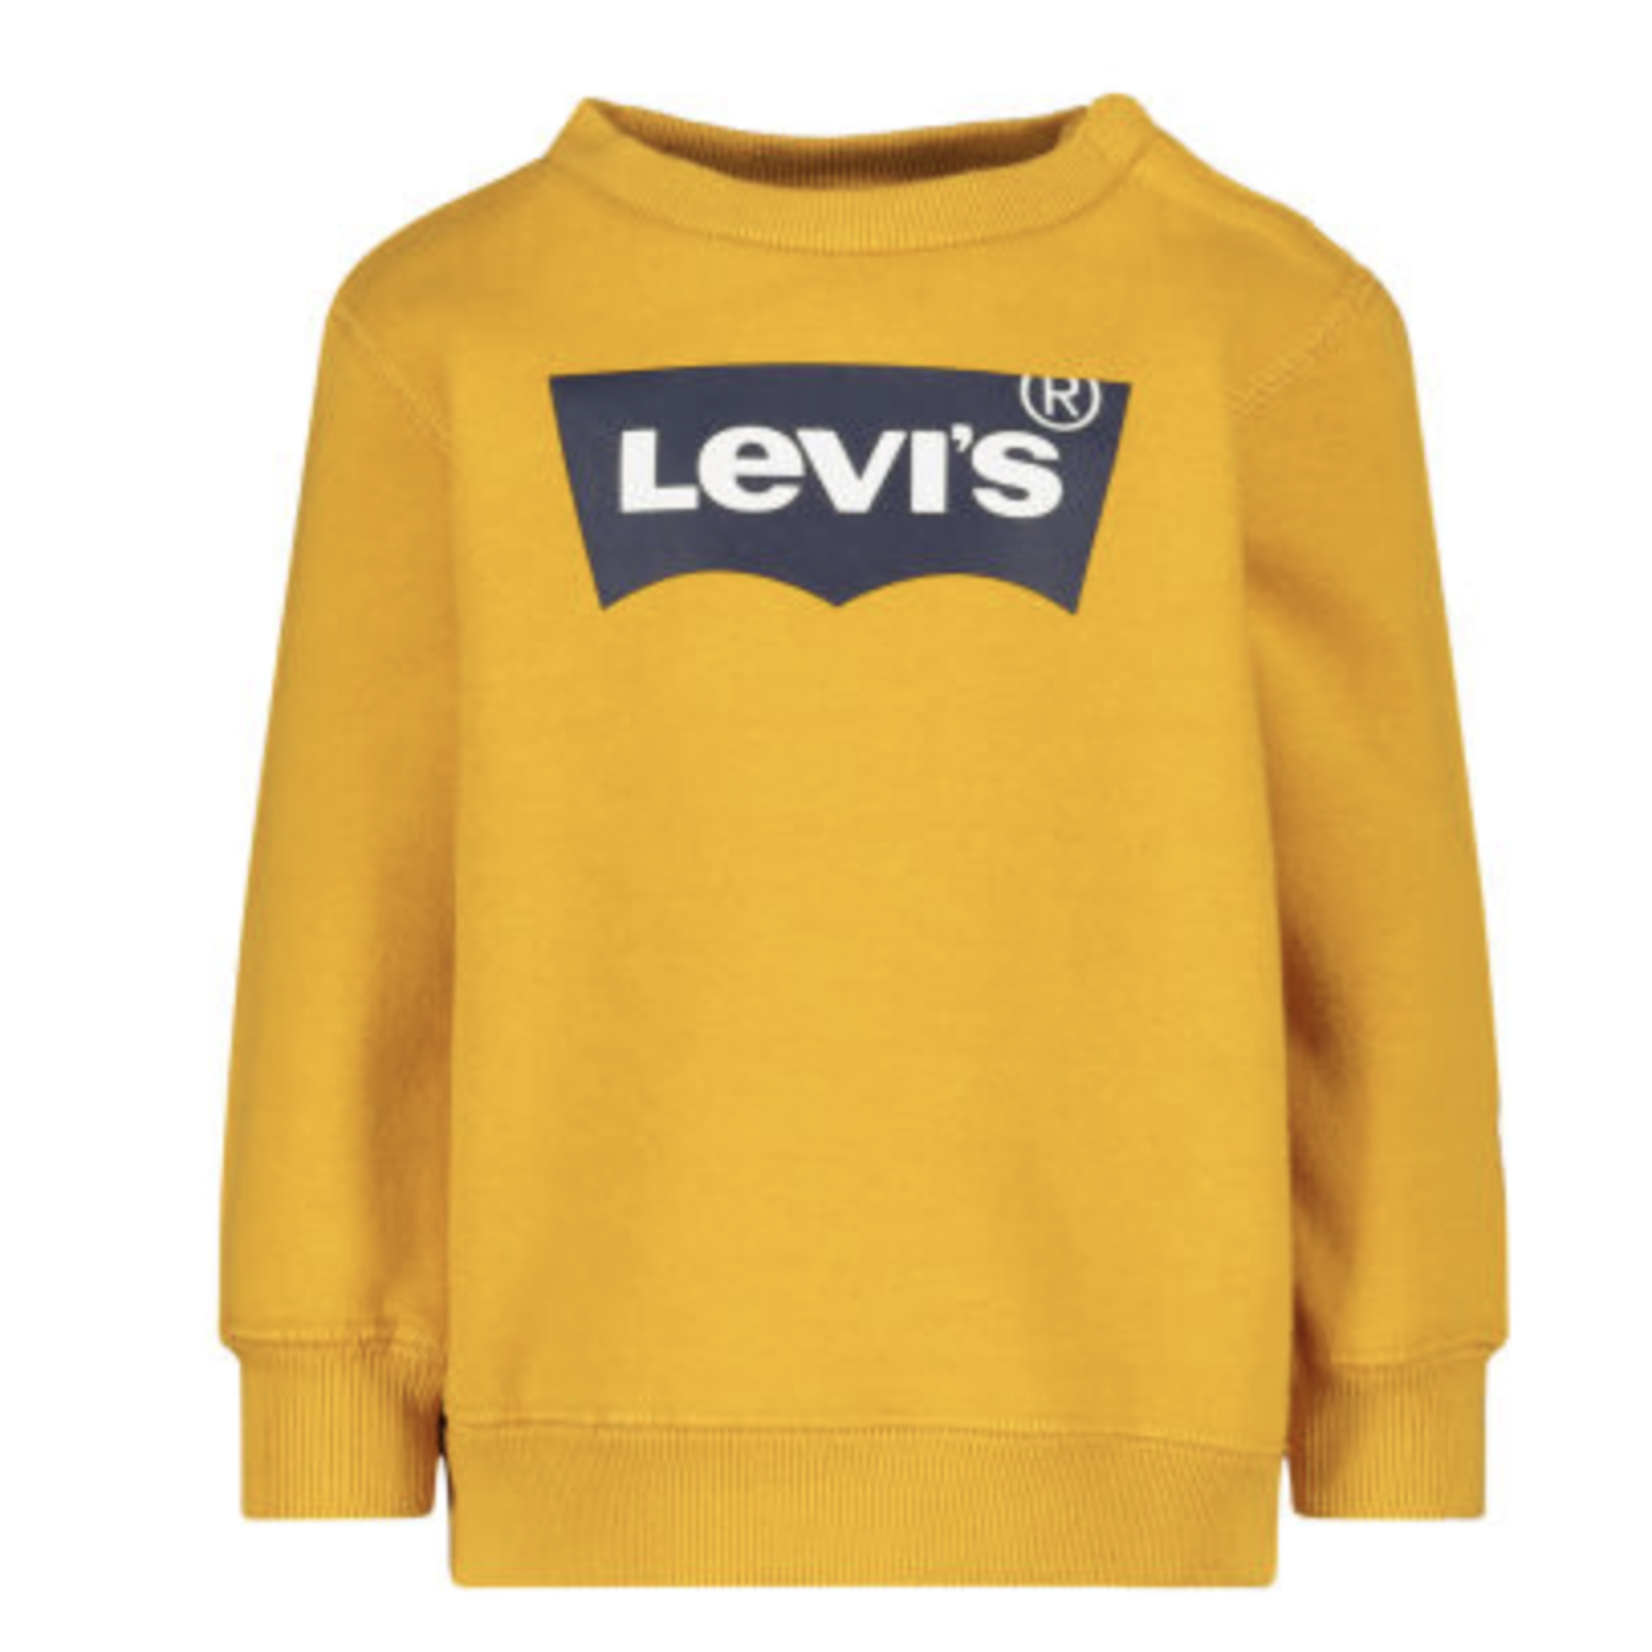 Levi's BATWING CREWNECK SWEATSHIRT